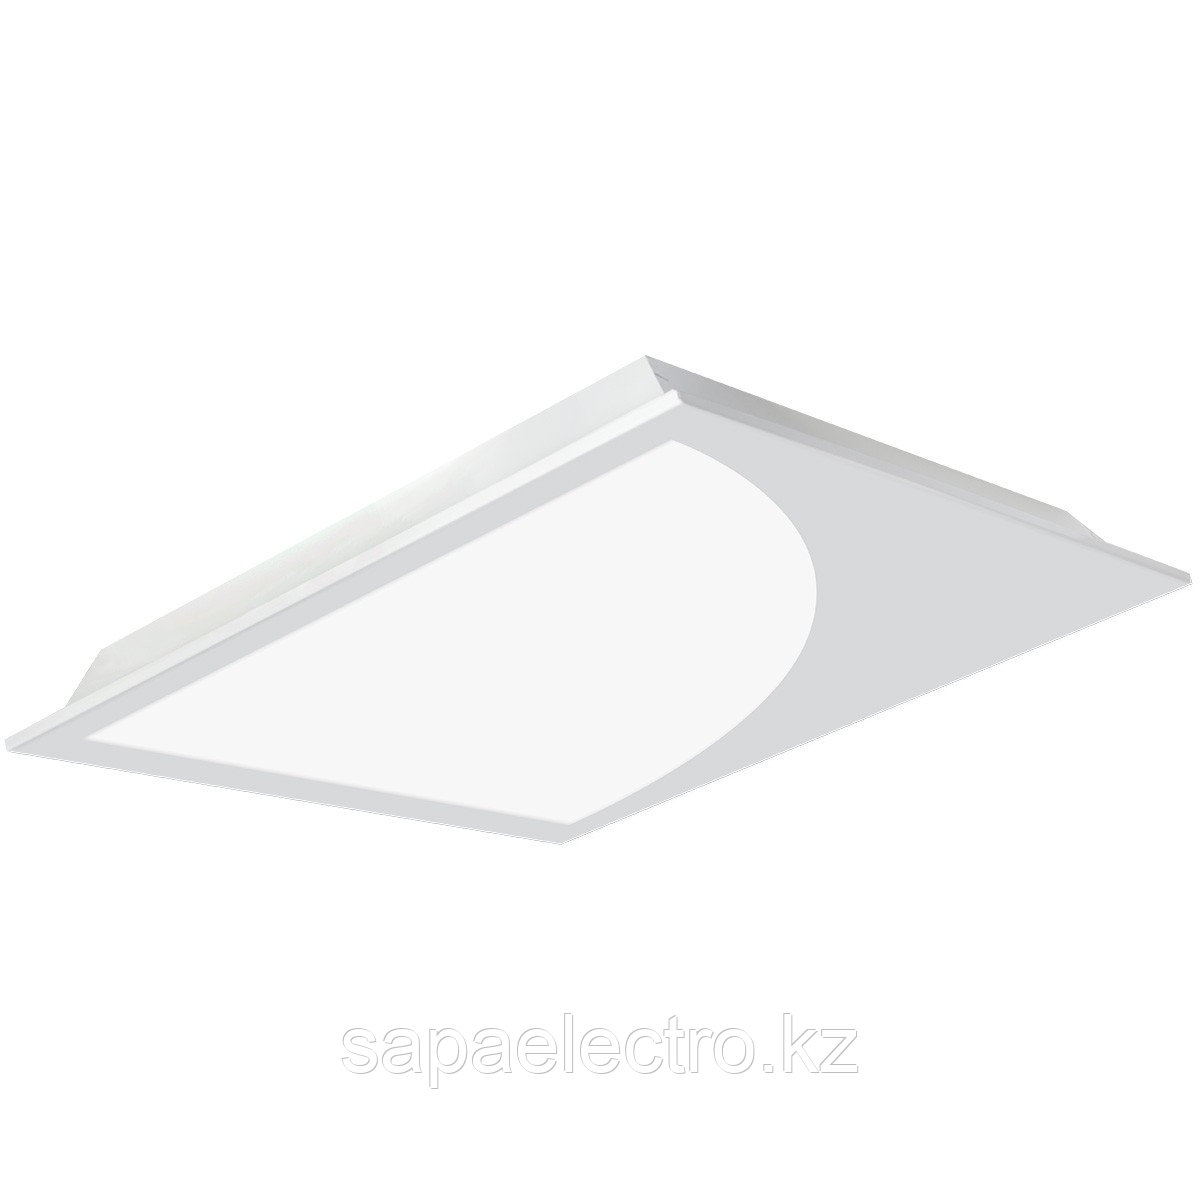 Св-к  OPALLED PLANET 48W WH S/A  600x600 4500K  MGL